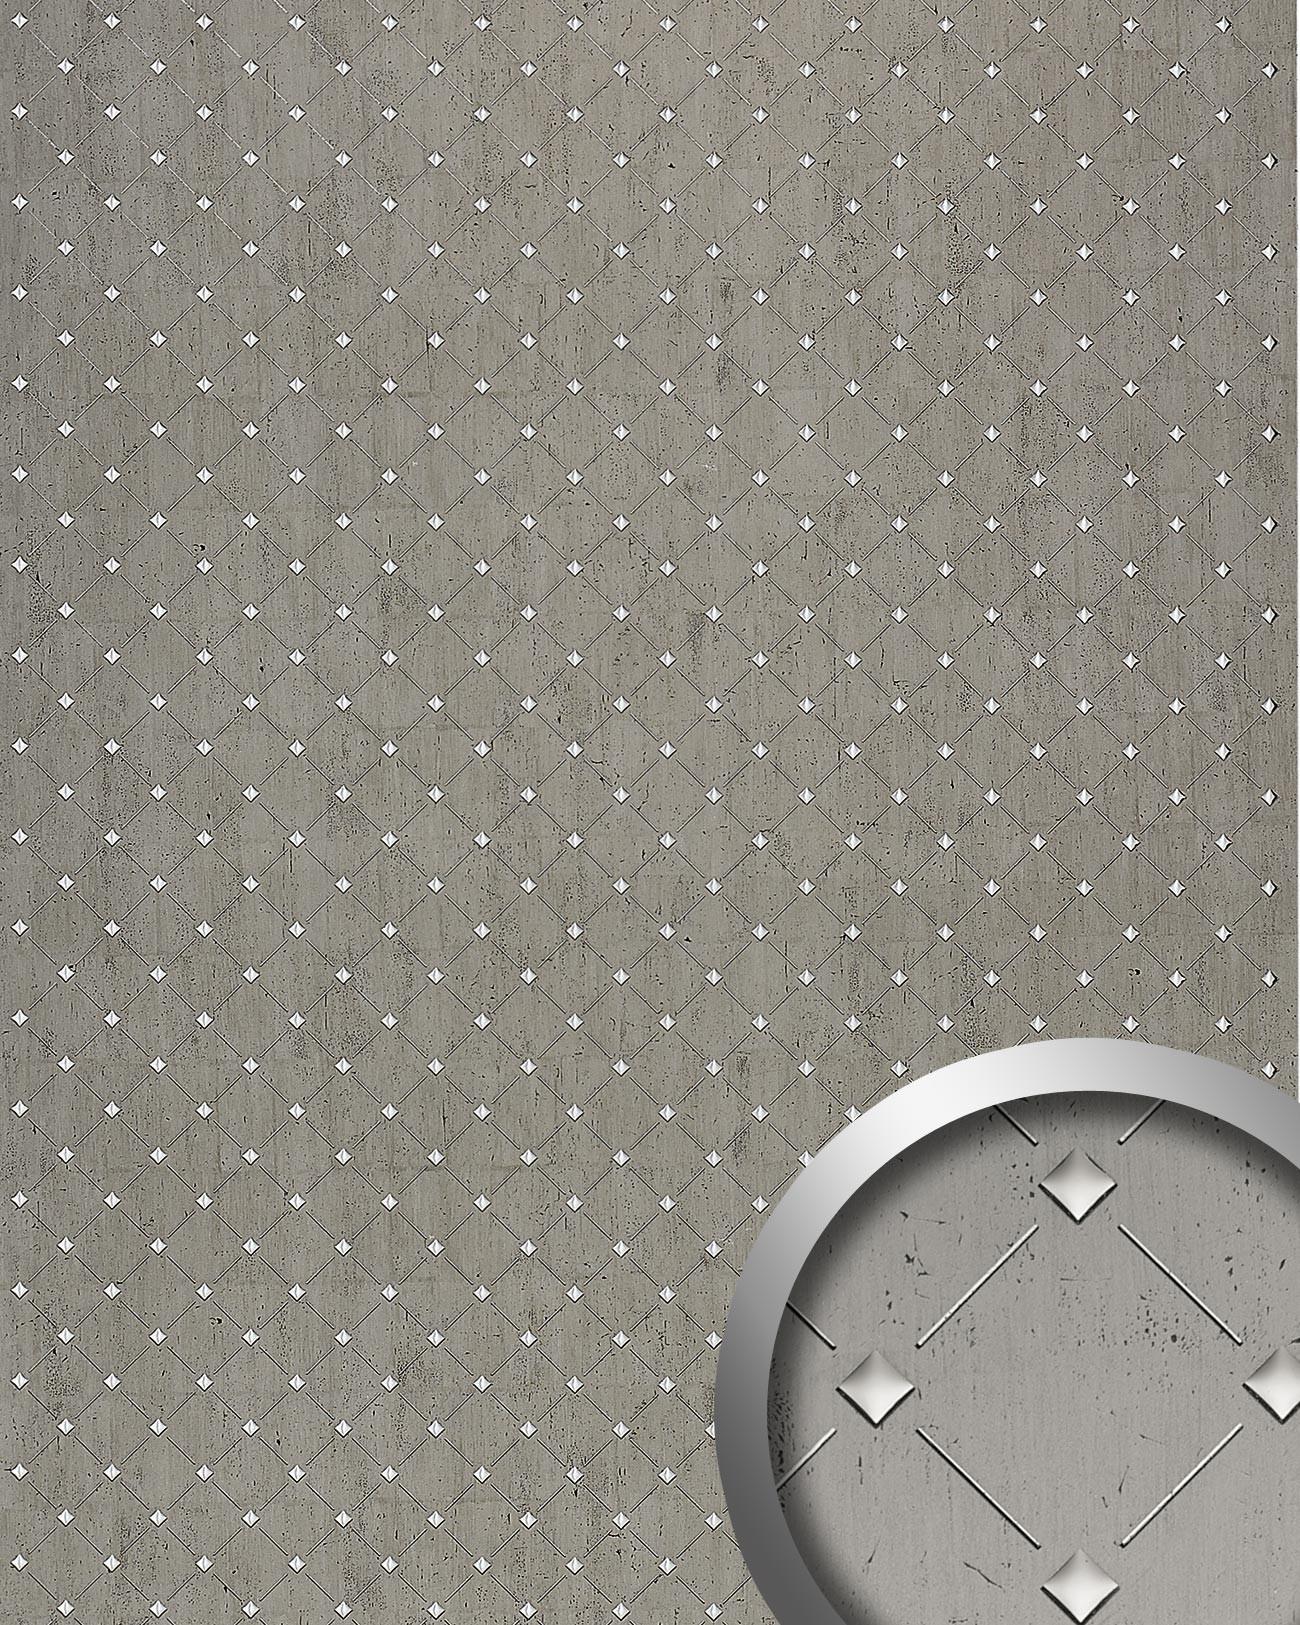 3d Wandpaneel 3d wandpaneel design wandverkleidung mosaik dekor wallface 17857 luxus paneel selbstklebend